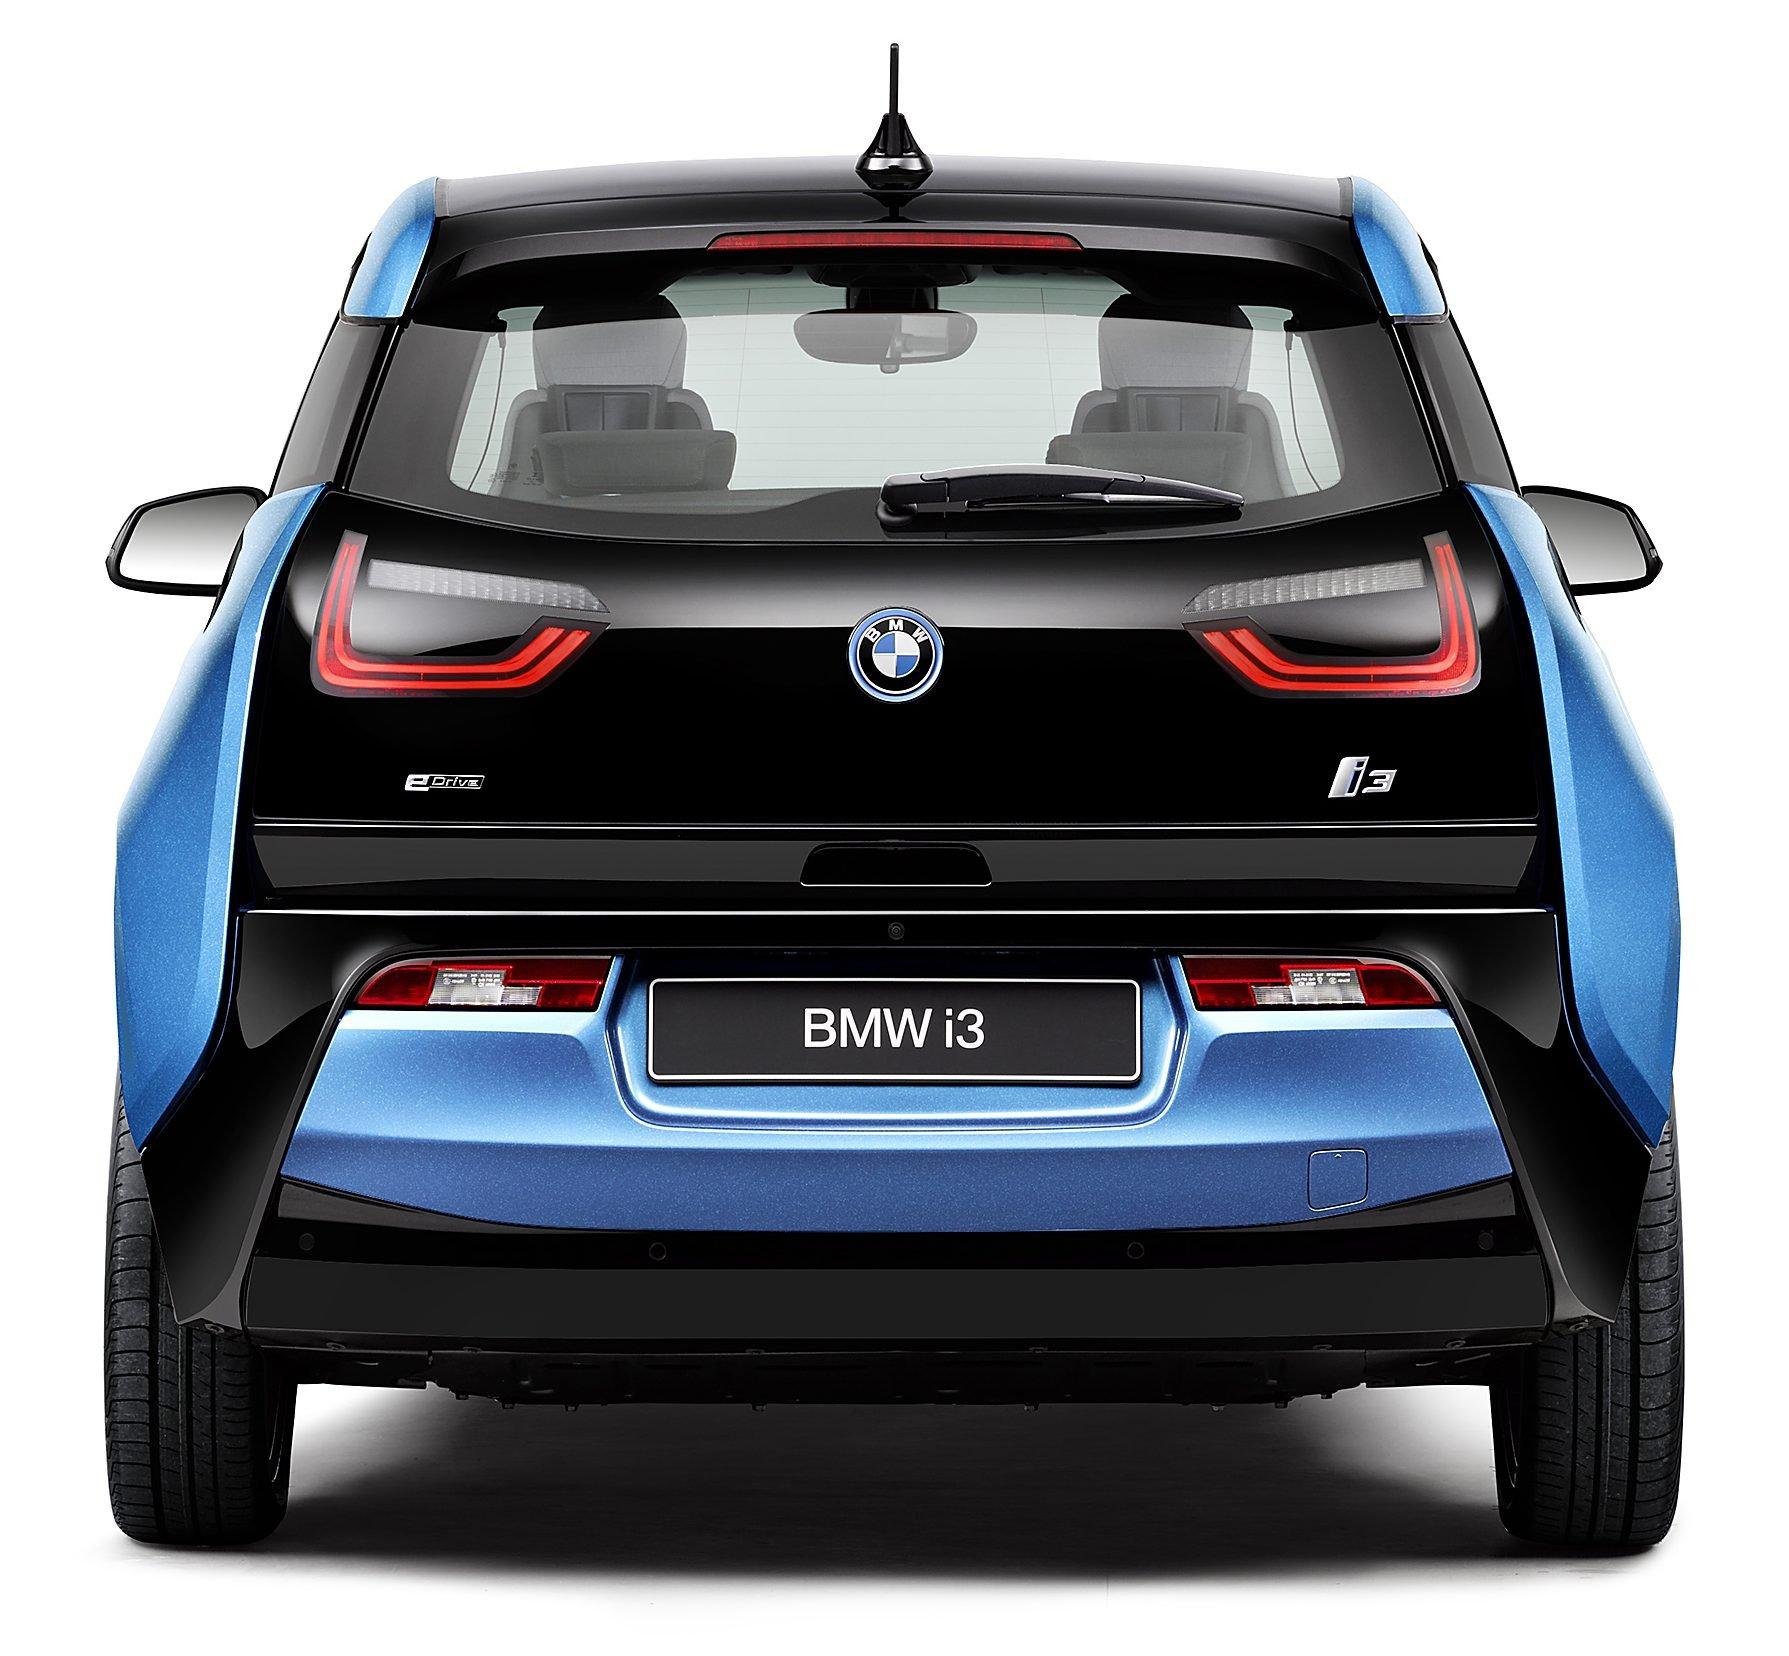 2017 BMW I3 Receives Larger Battery